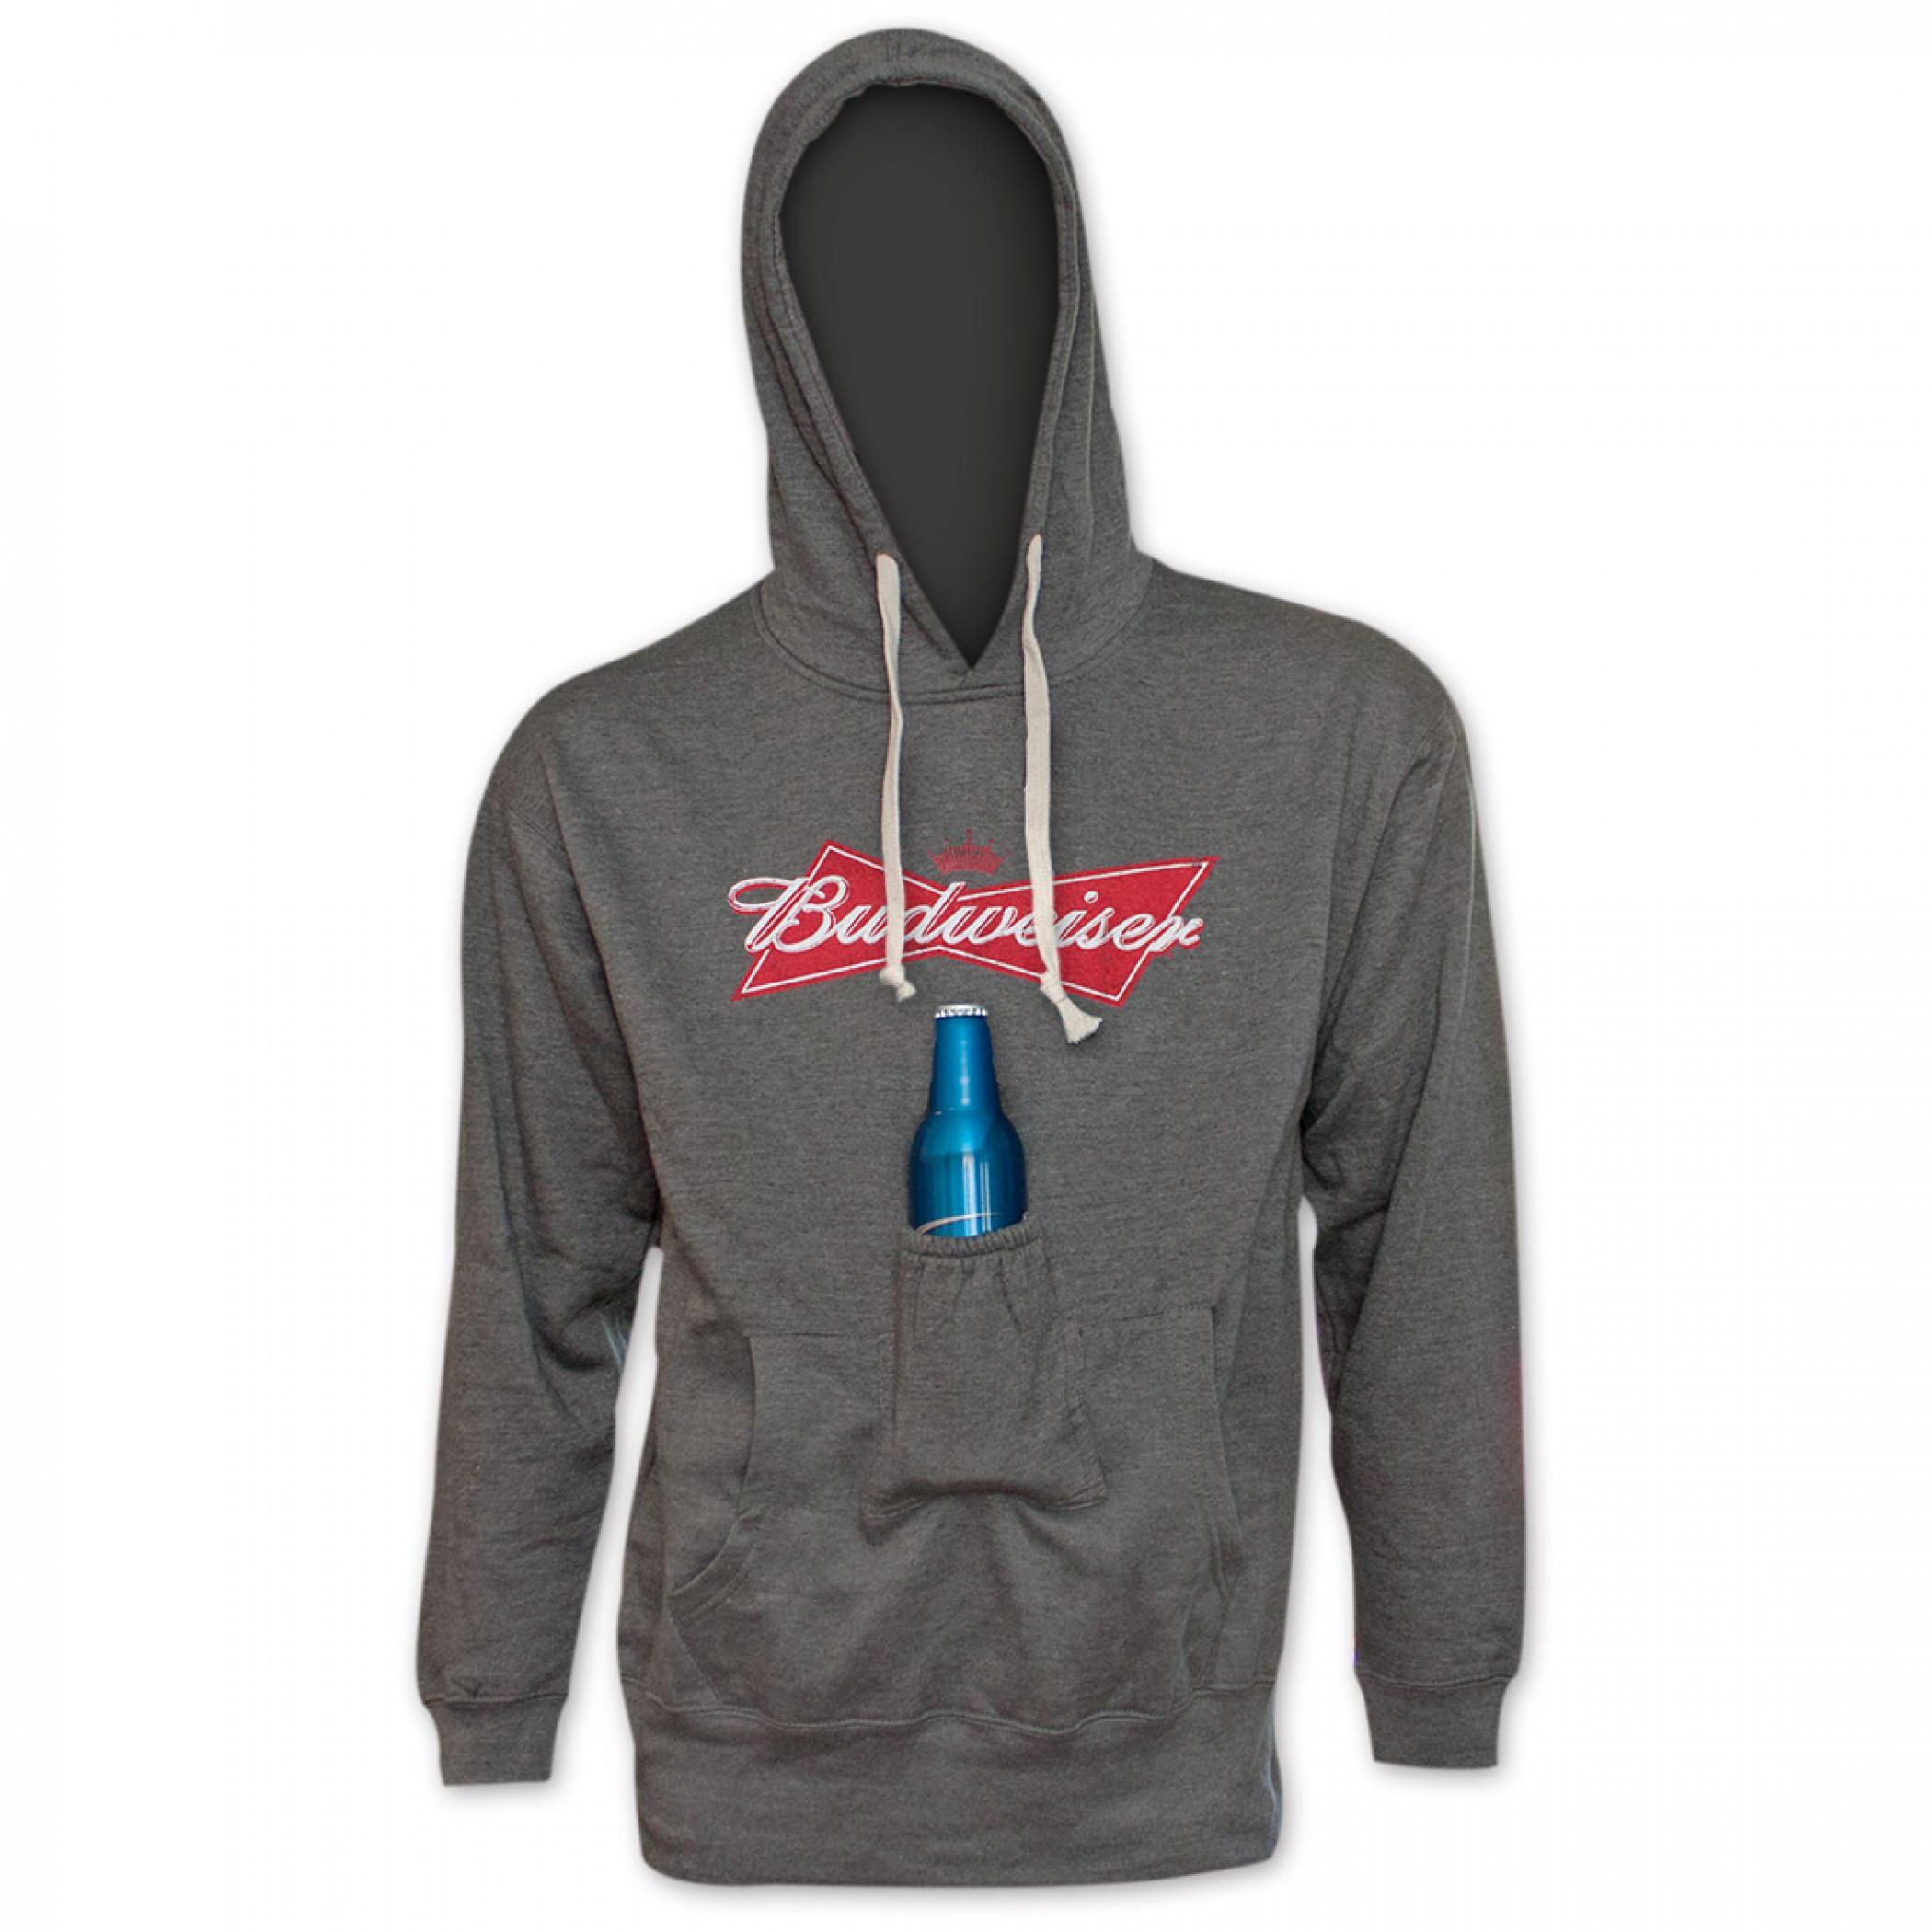 Budweiser Bowtie Logo Beer Pouch Hoodie